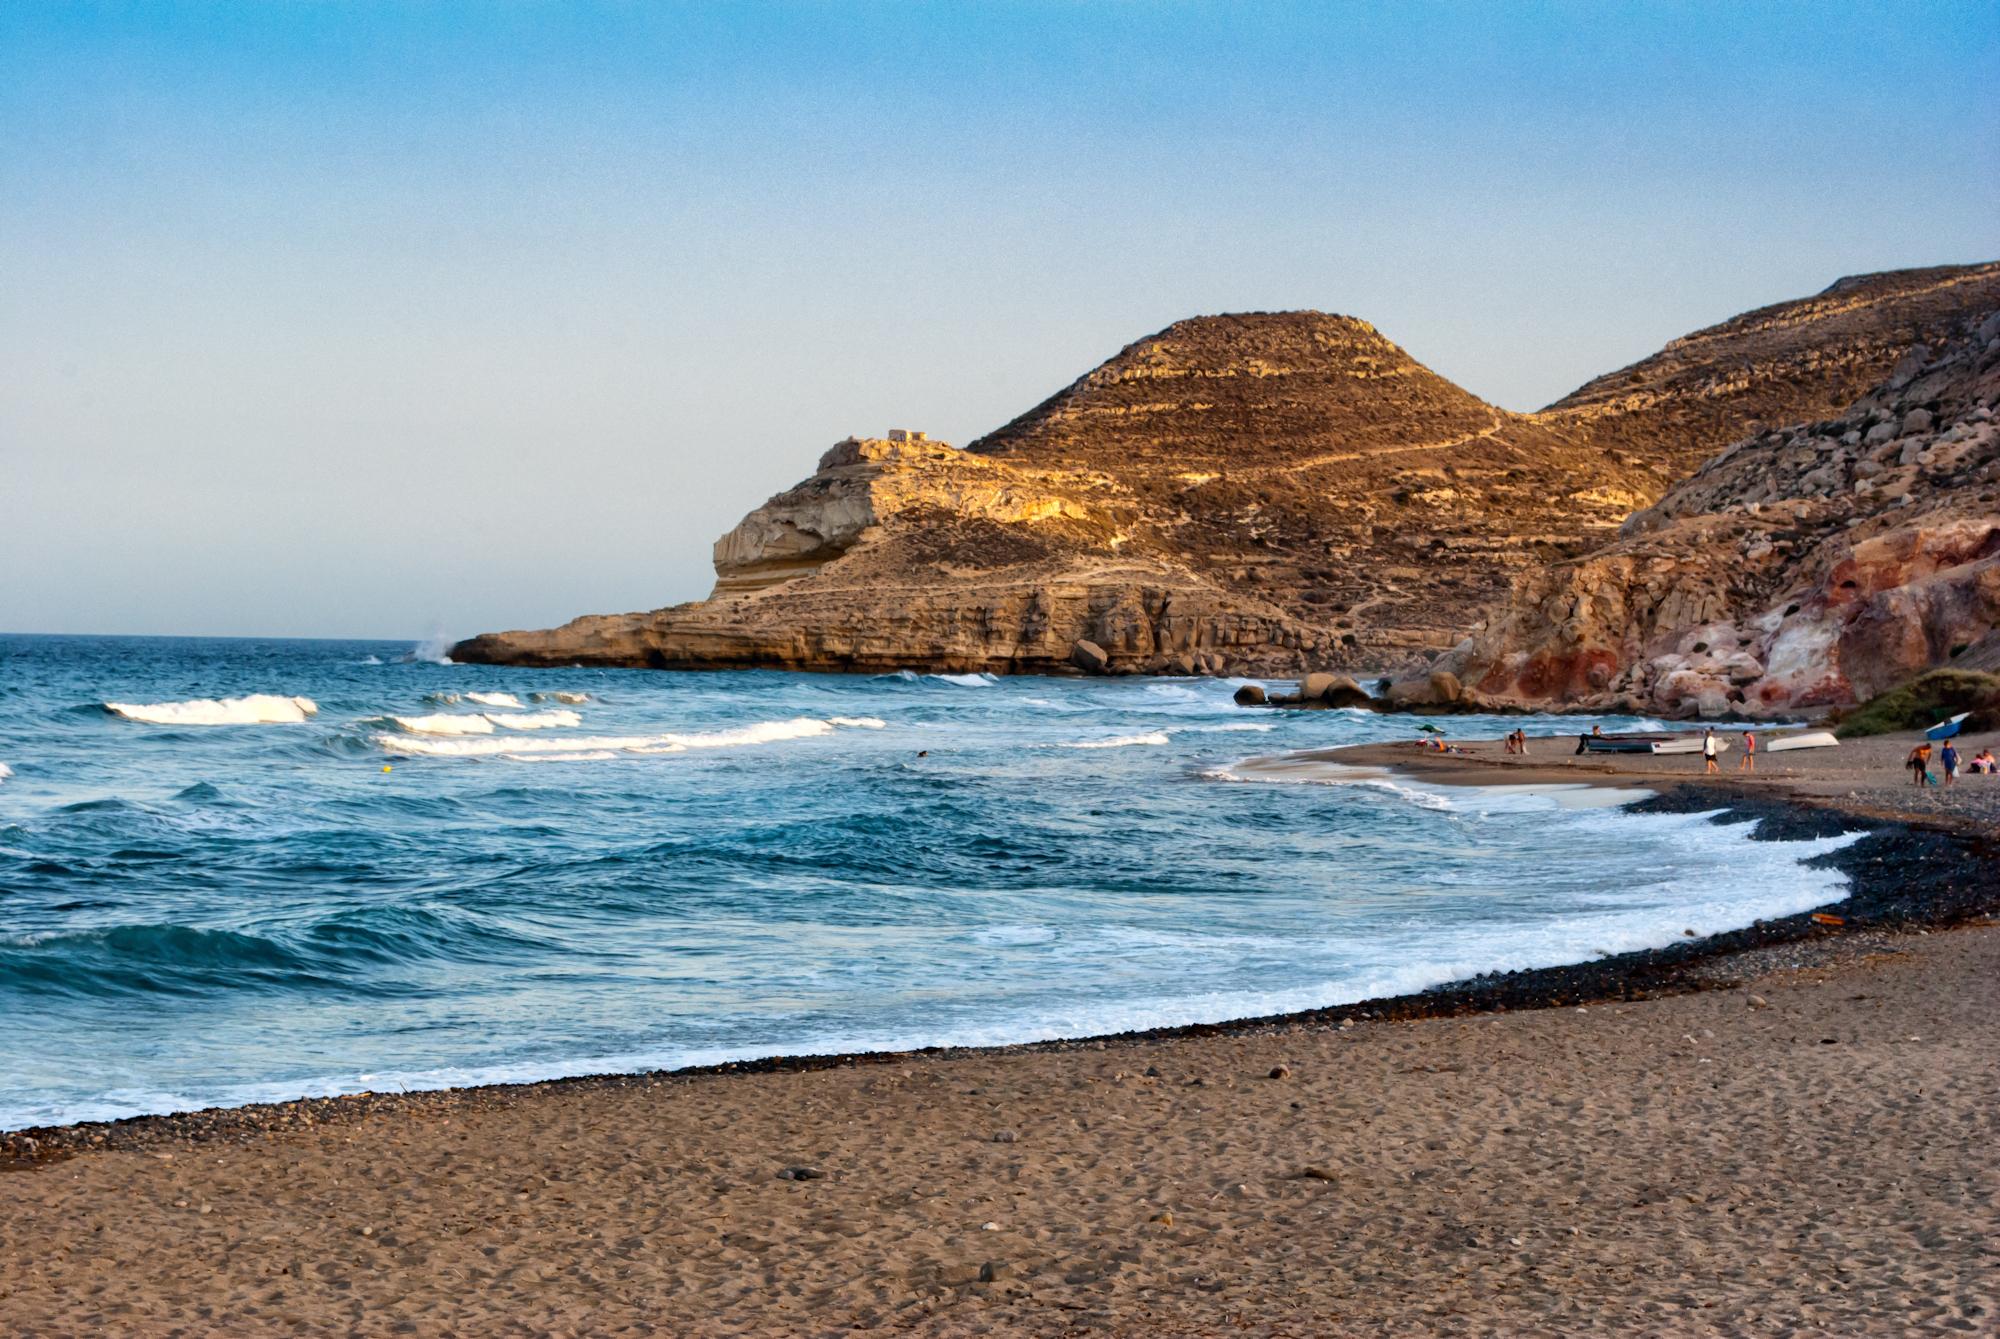 Las Negras beach, Almeria